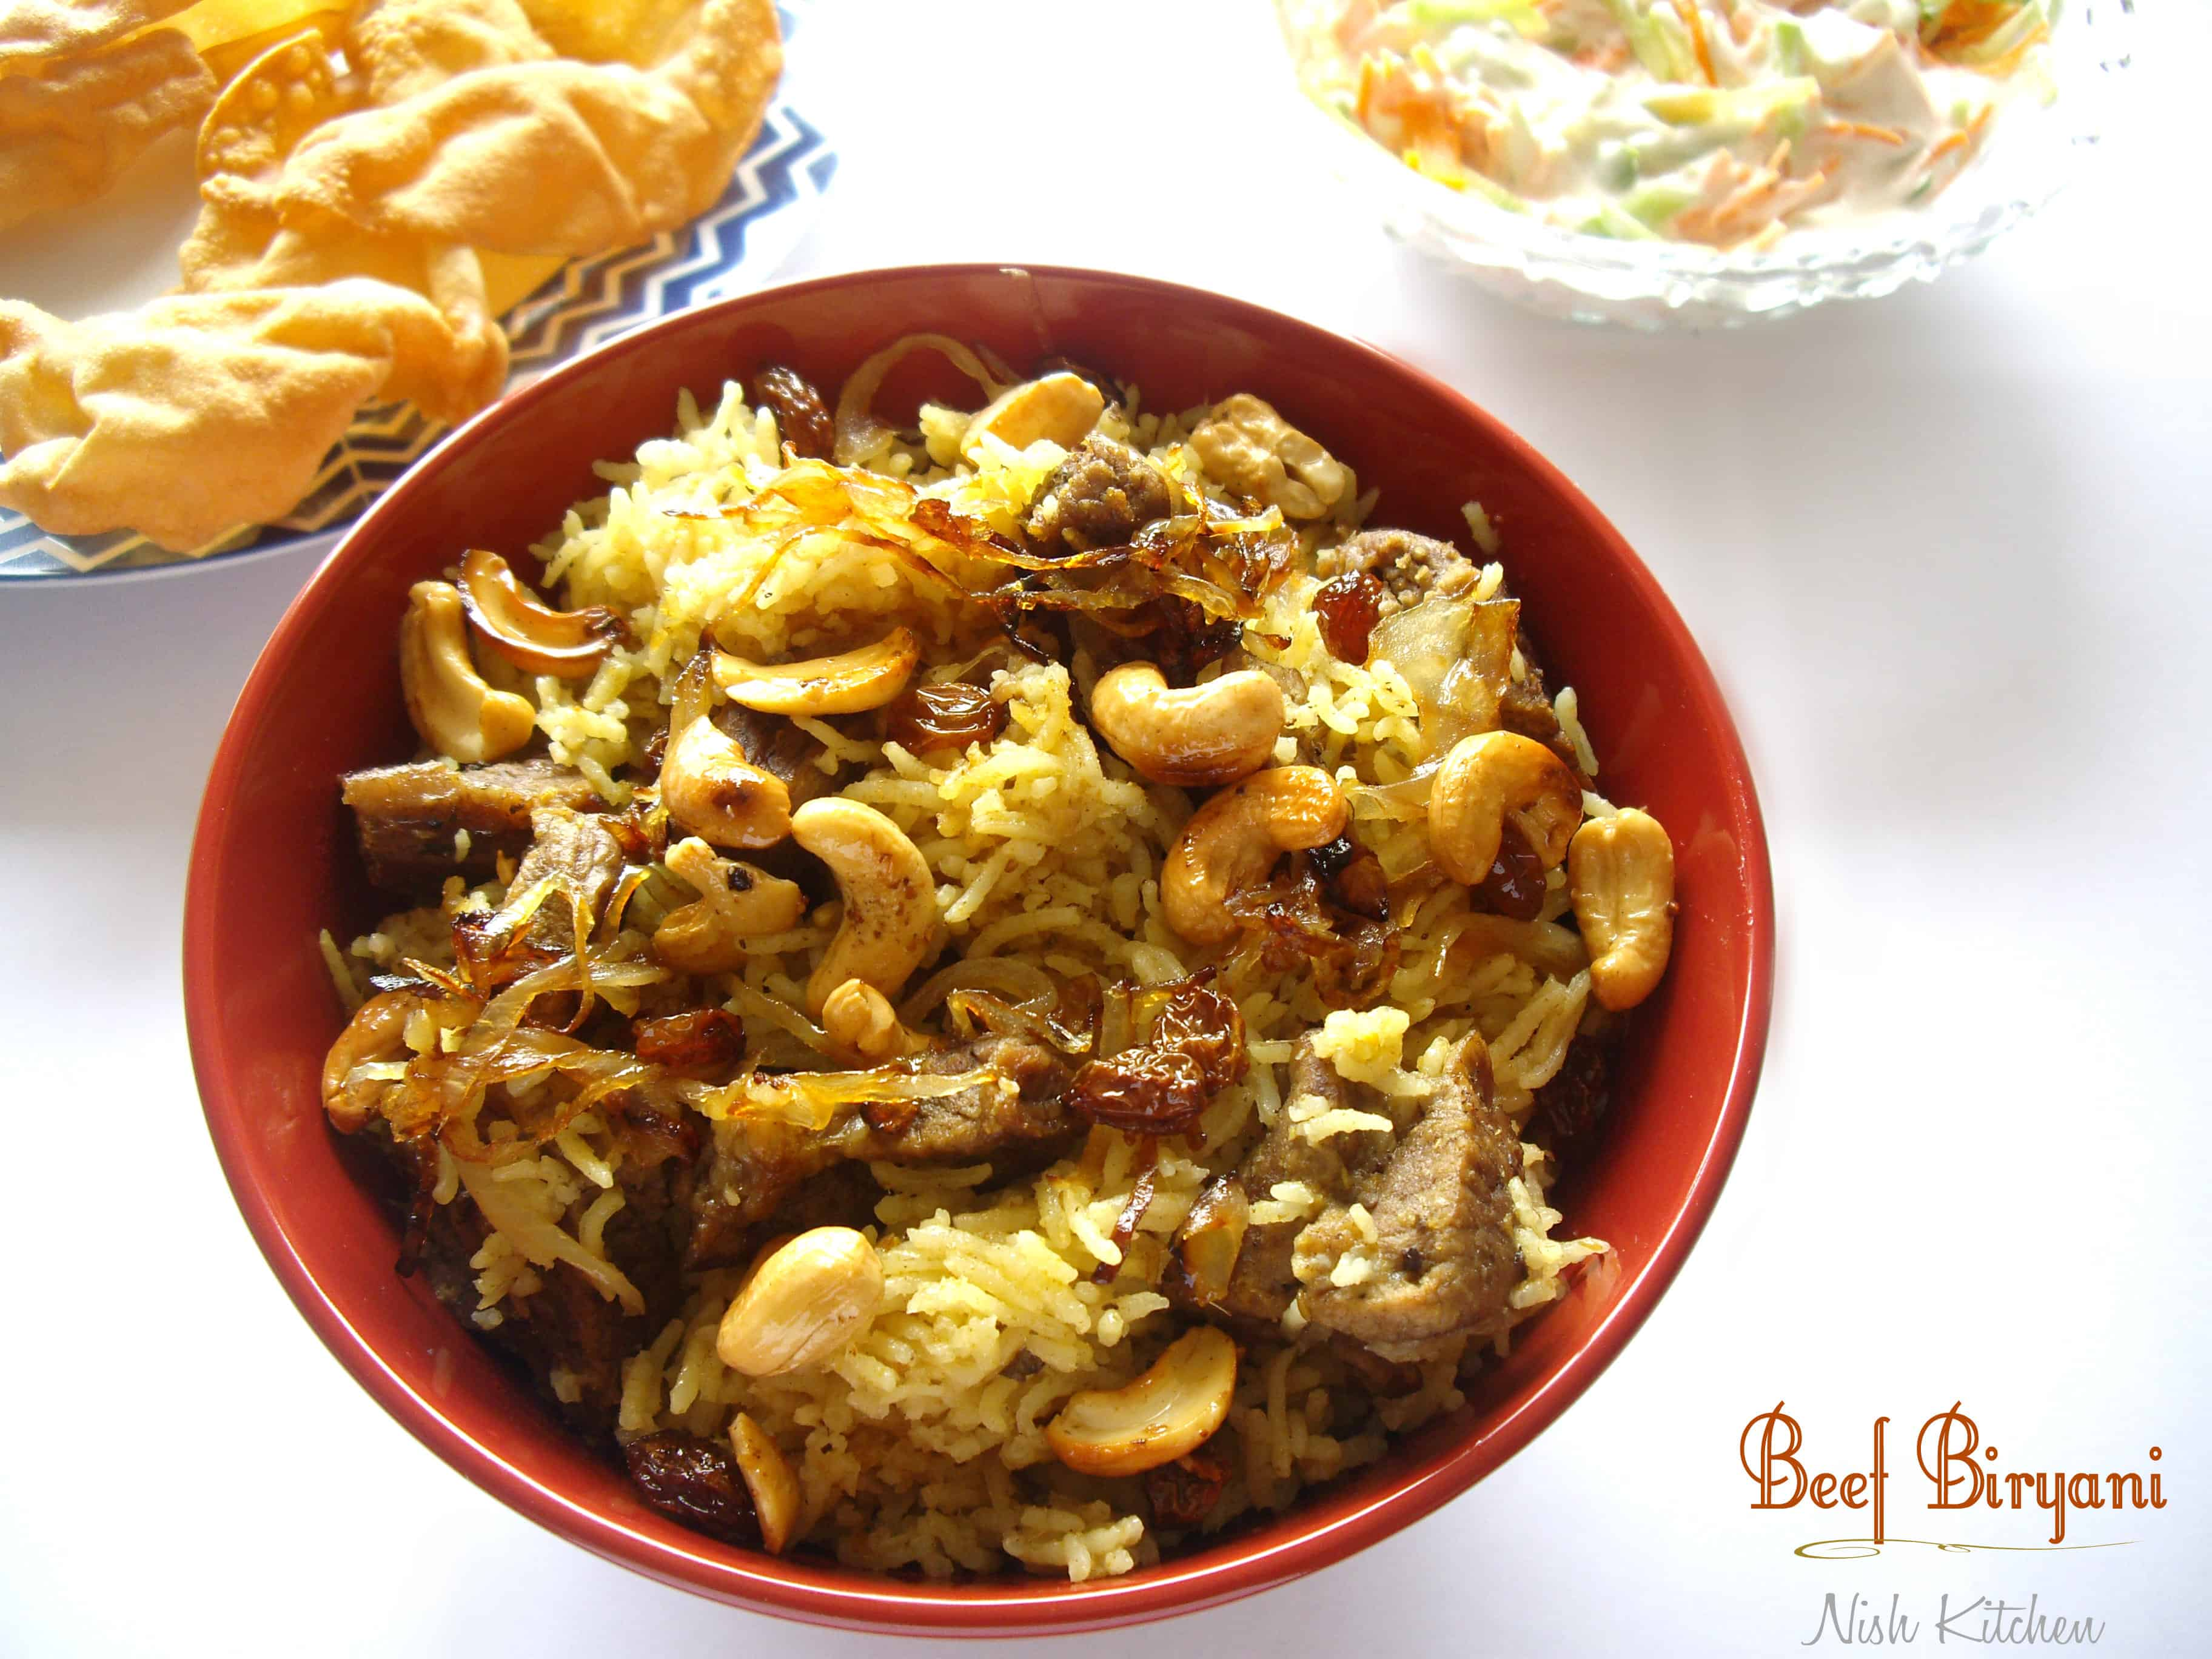 Watch How to Make Beef Biryani video